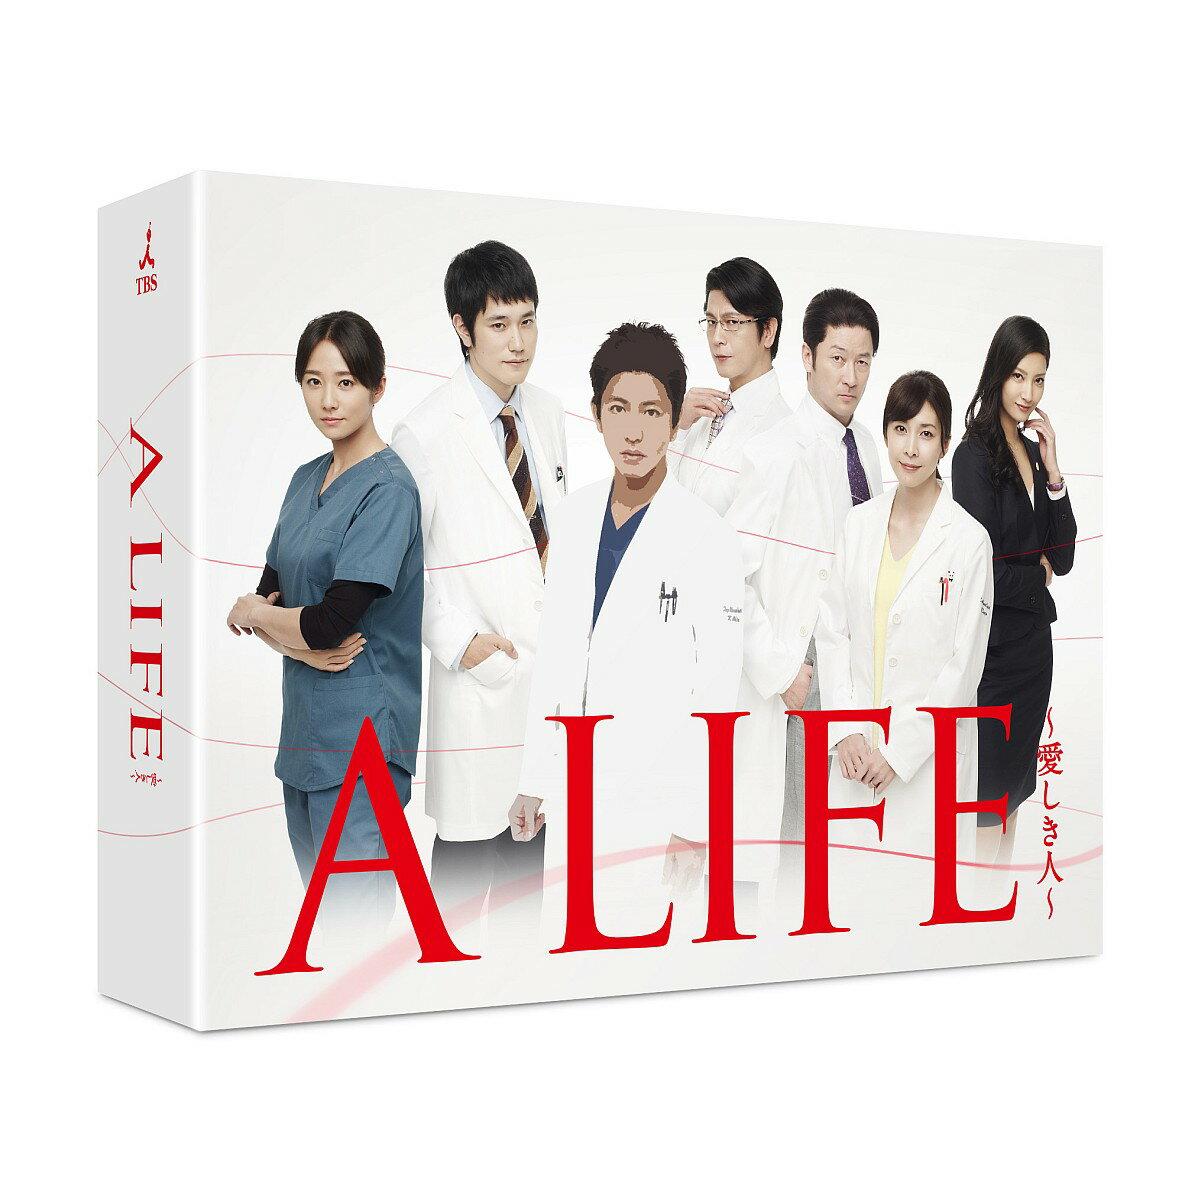 A LIFE〜愛しき人〜Blu-ray BOX【Blu-ray】 [ 木村拓哉 ]